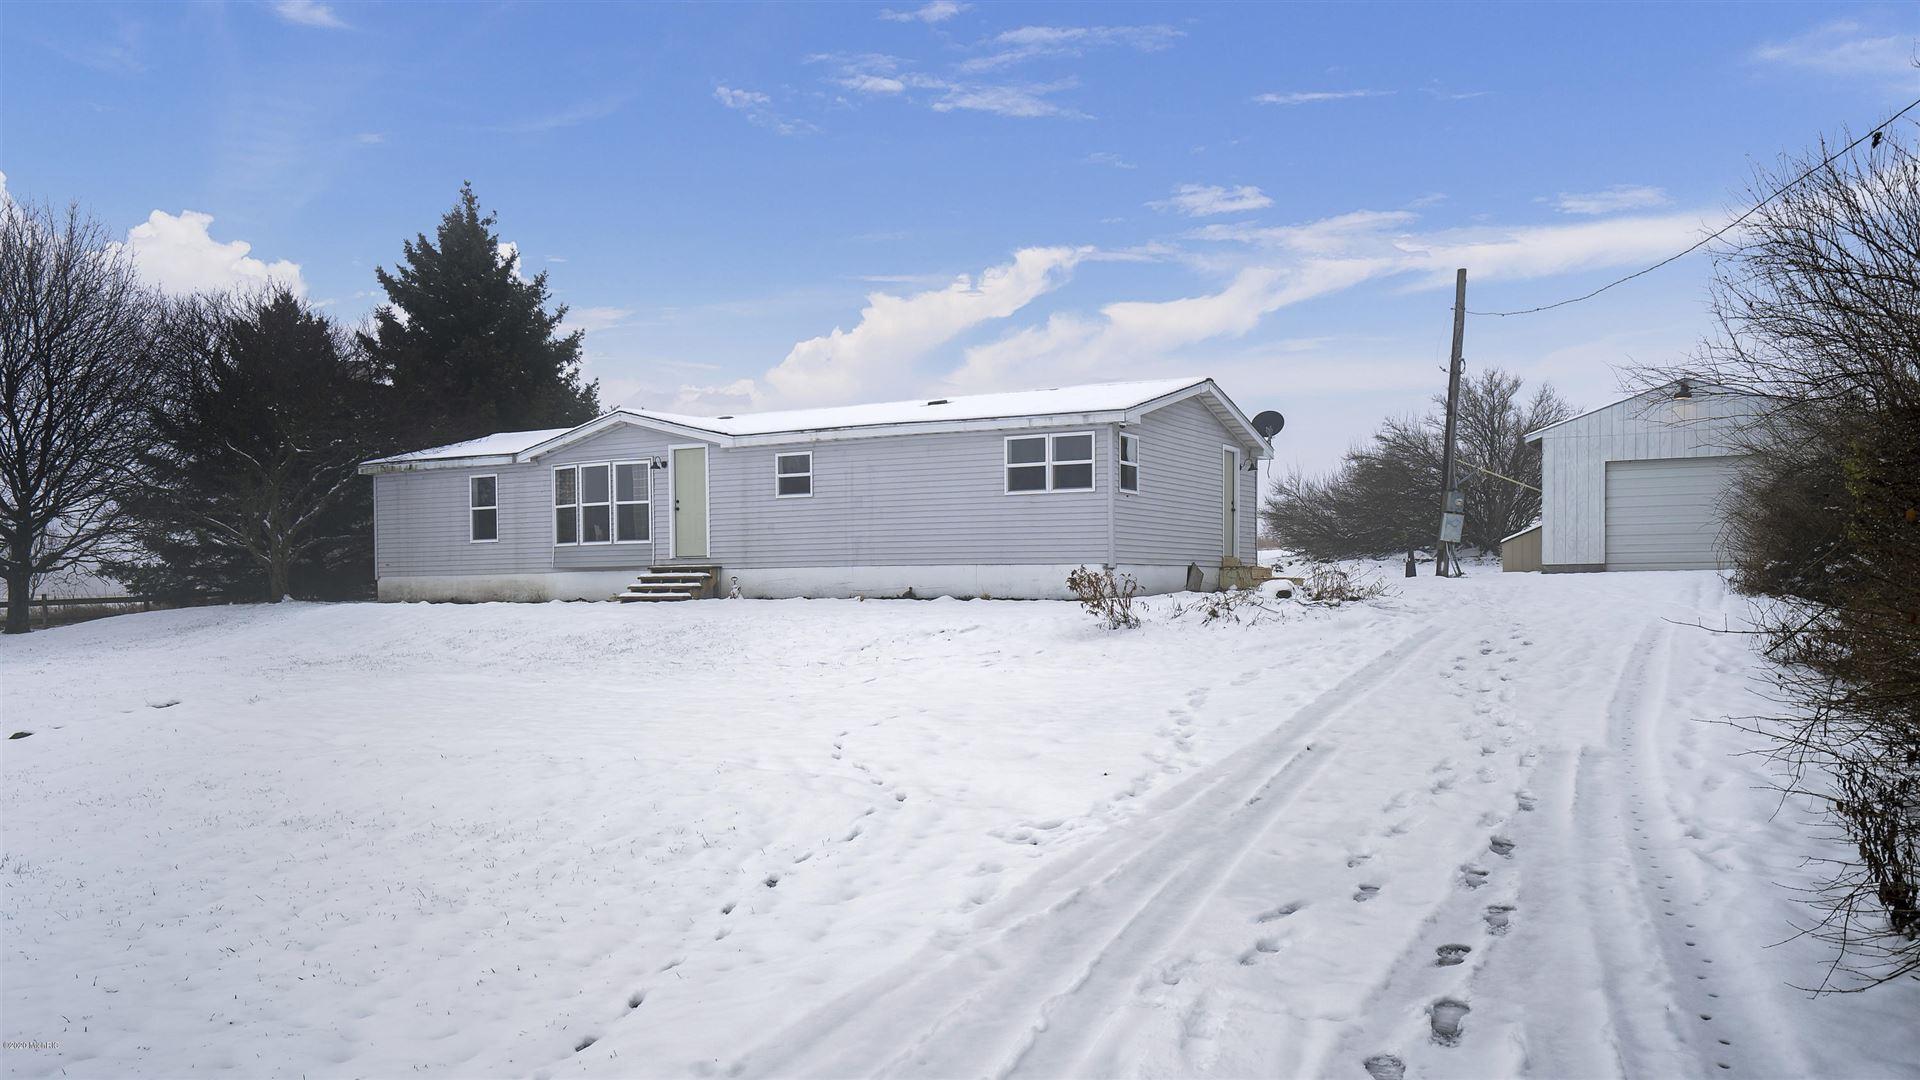 22187 18 Mile Road, Big Rapids, MI 49307 - MLS#: 20048877